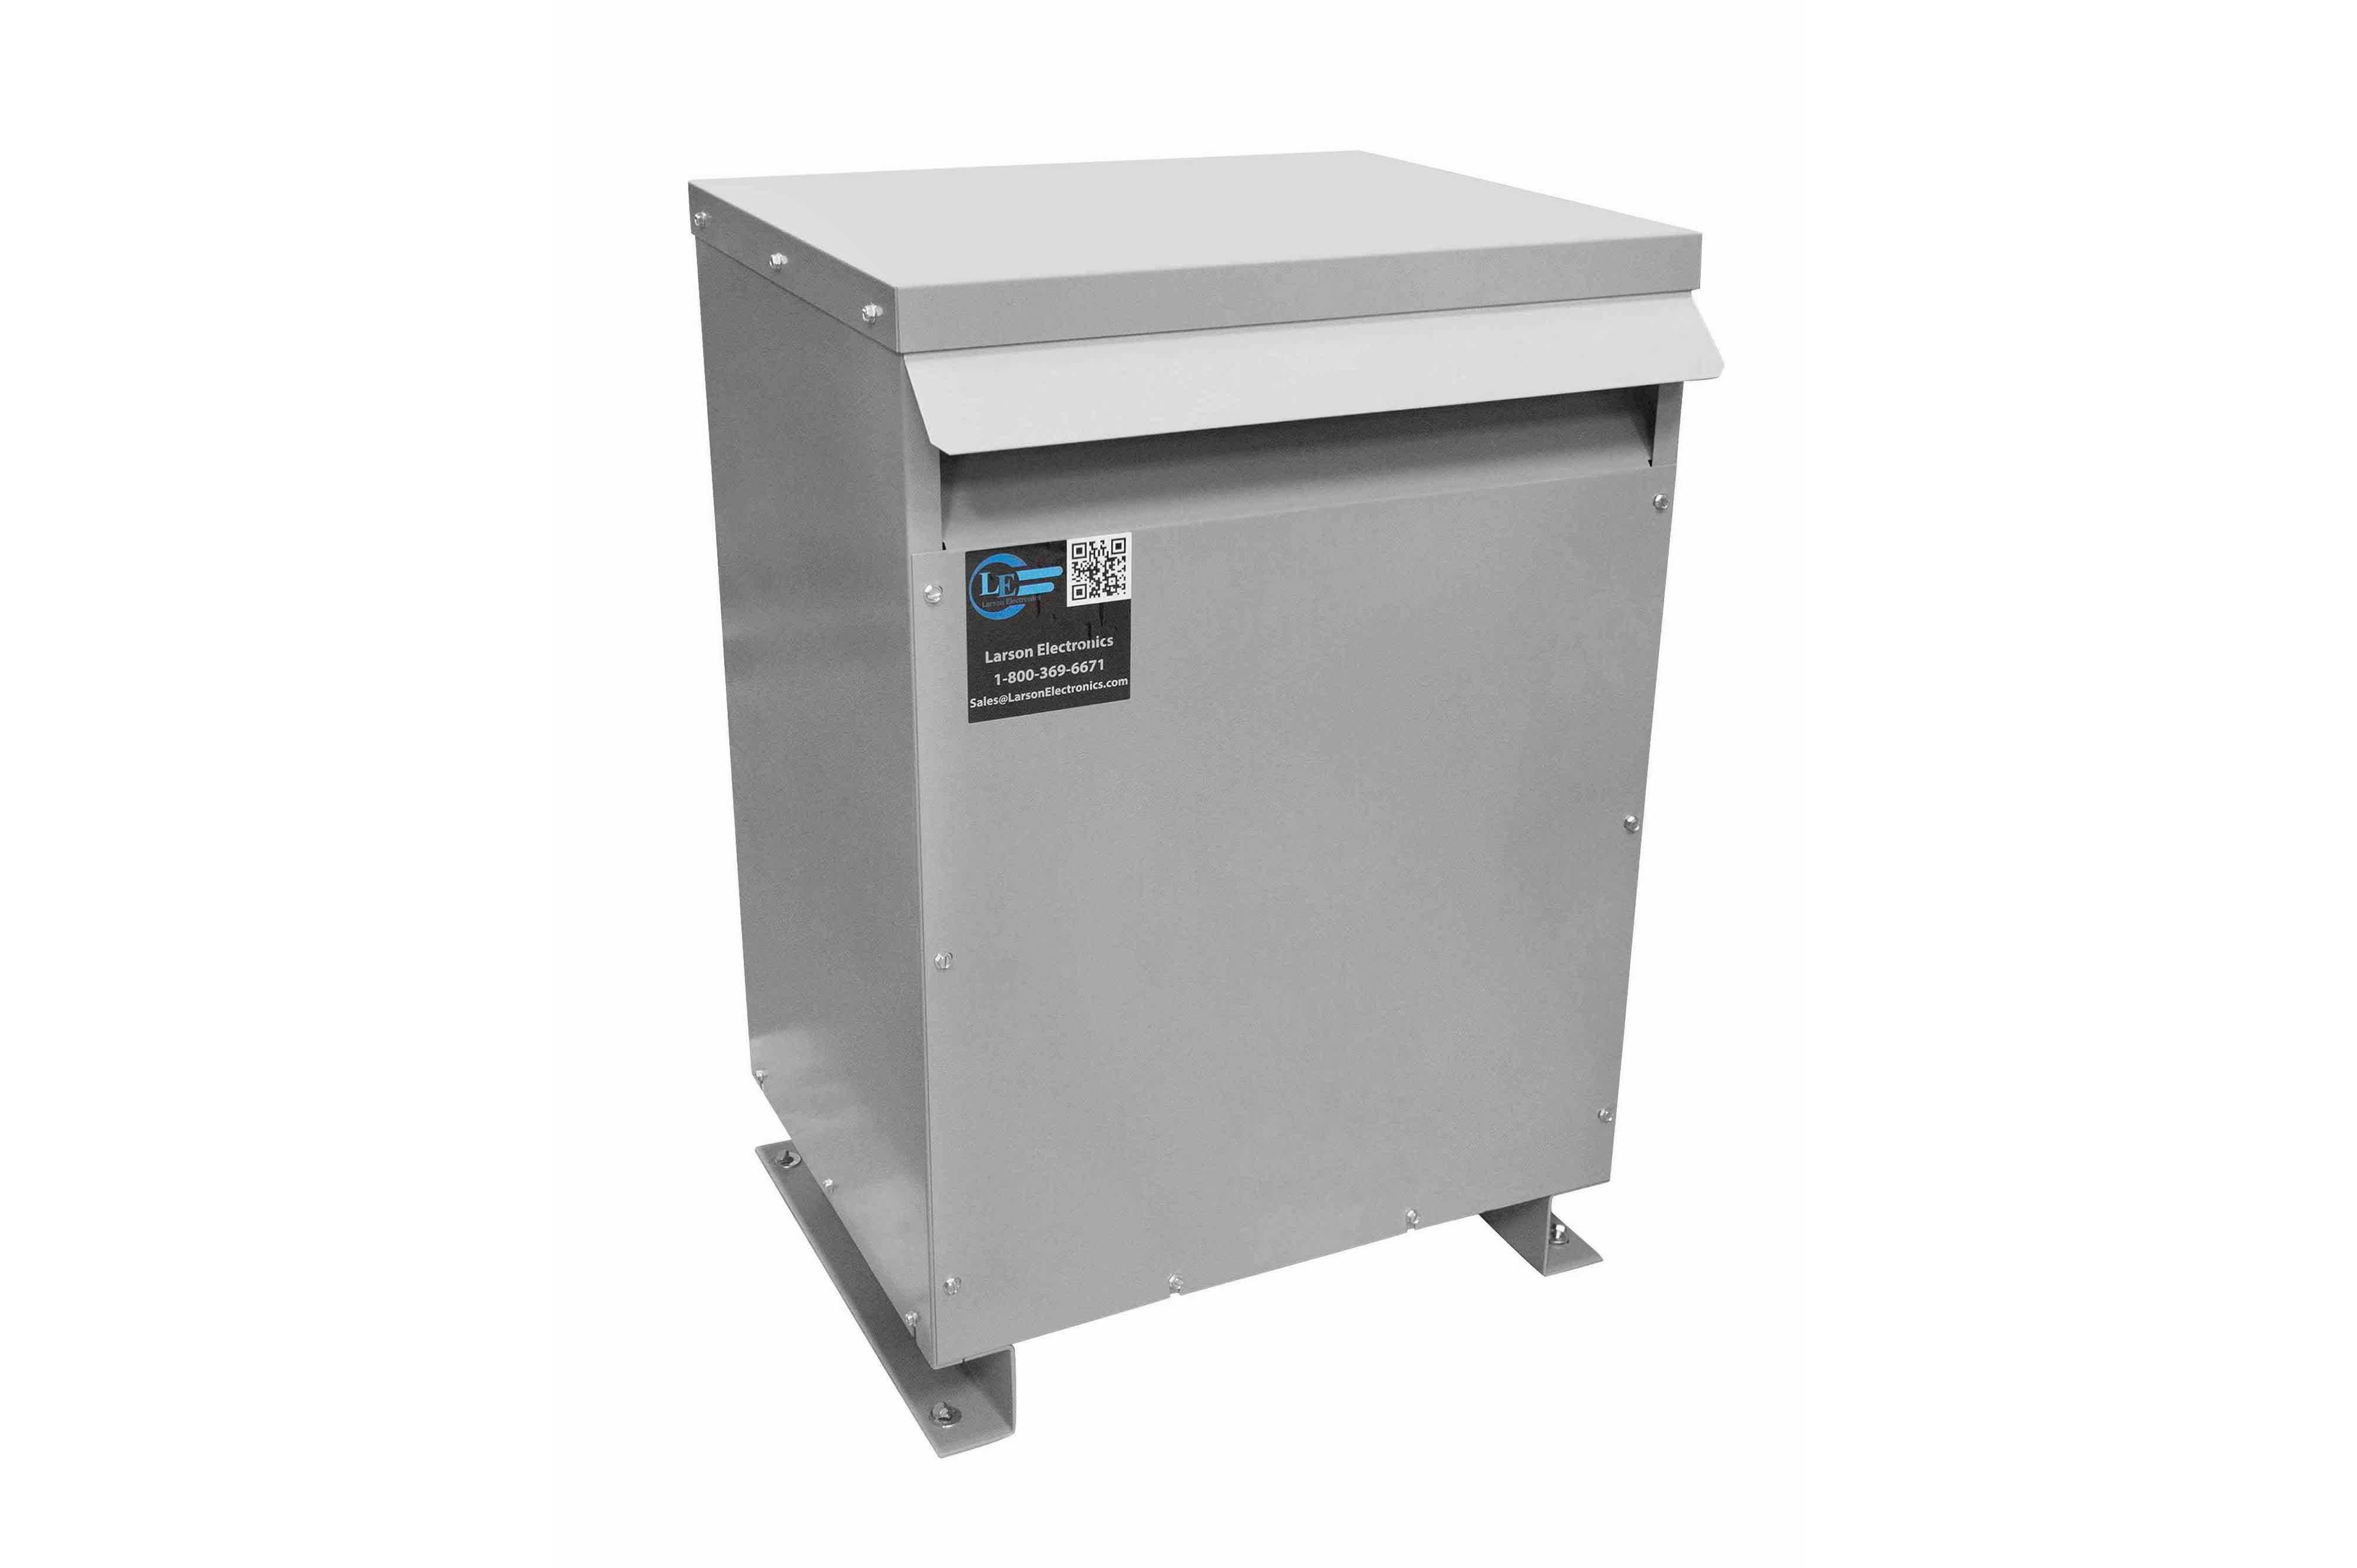 13 kVA 3PH Isolation Transformer, 575V Wye Primary, 208Y/120 Wye-N Secondary, N3R, Ventilated, 60 Hz